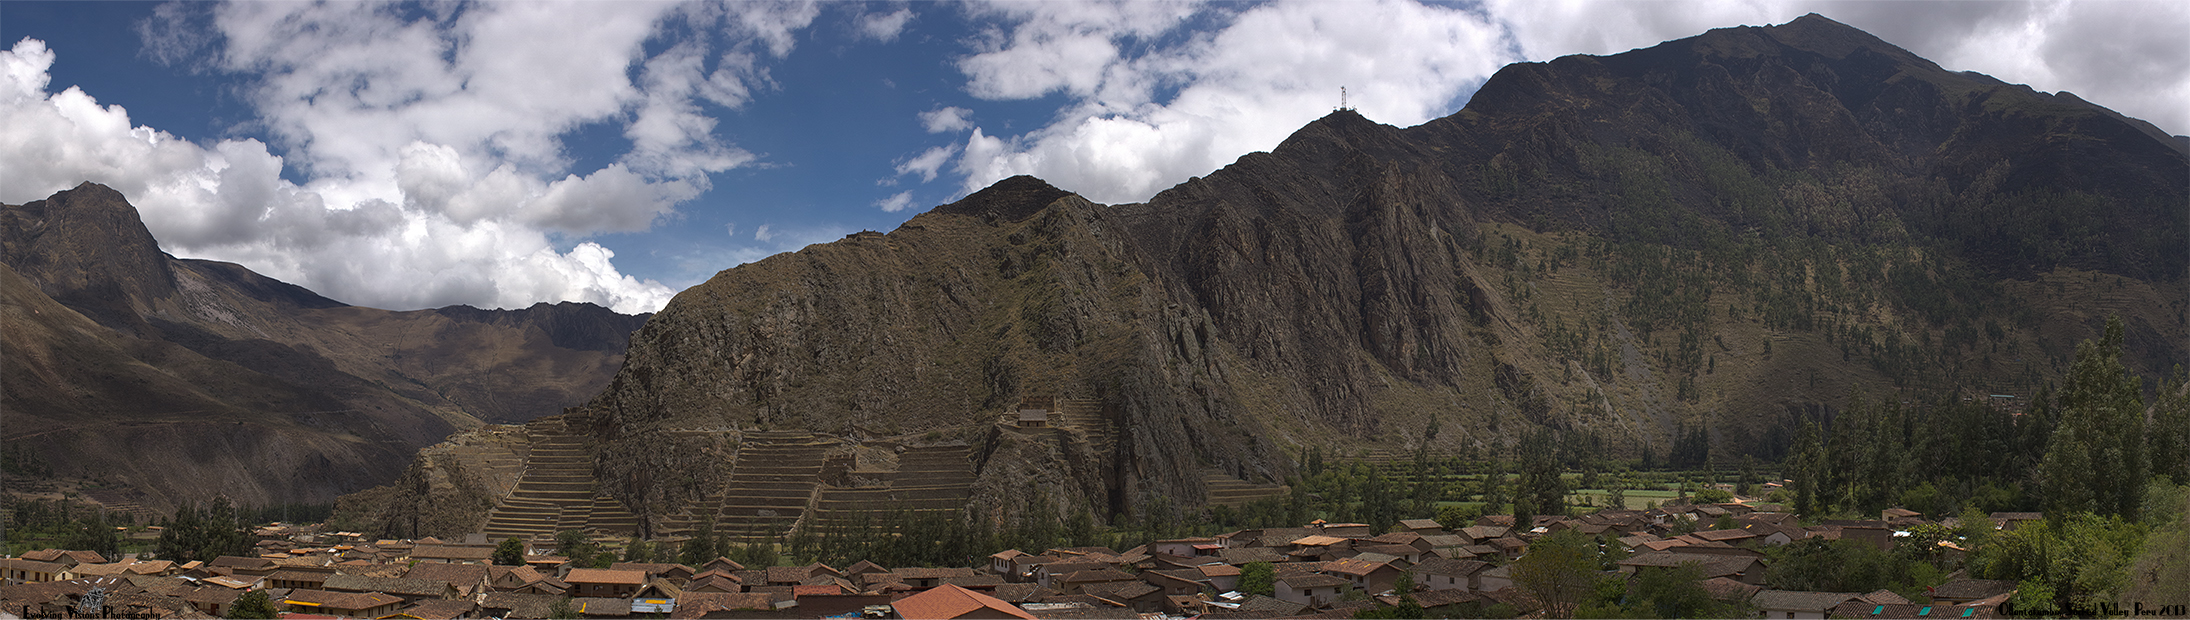 Ollantatambo, Sacred Valley 2013